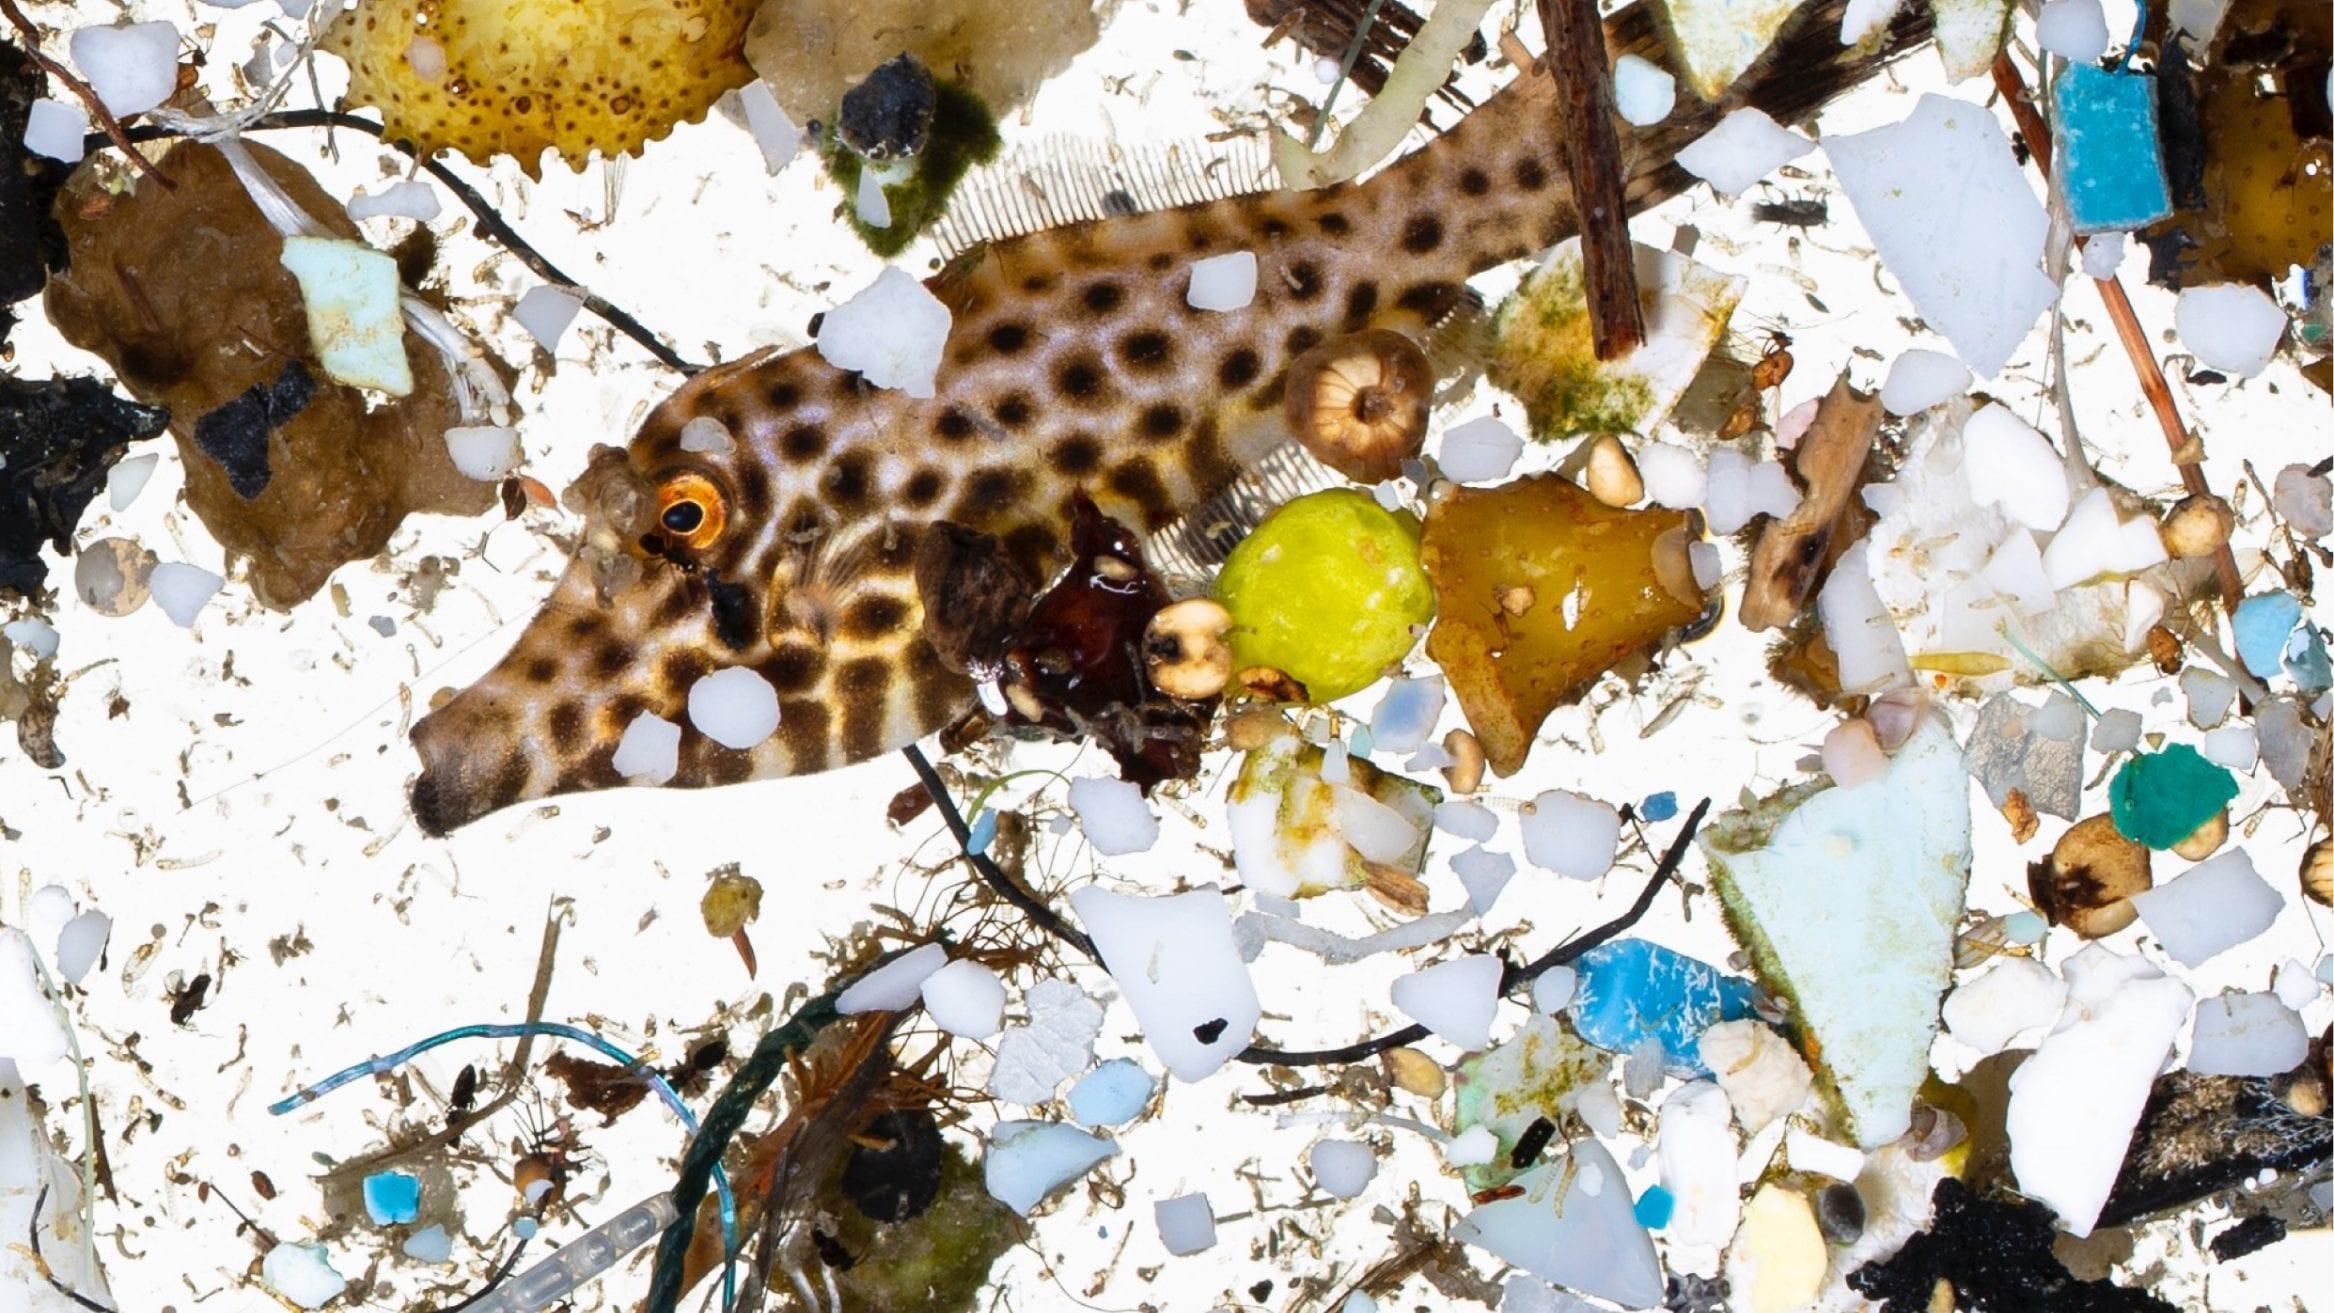 NOAA ocean plastic larval fish microplastics microfibres